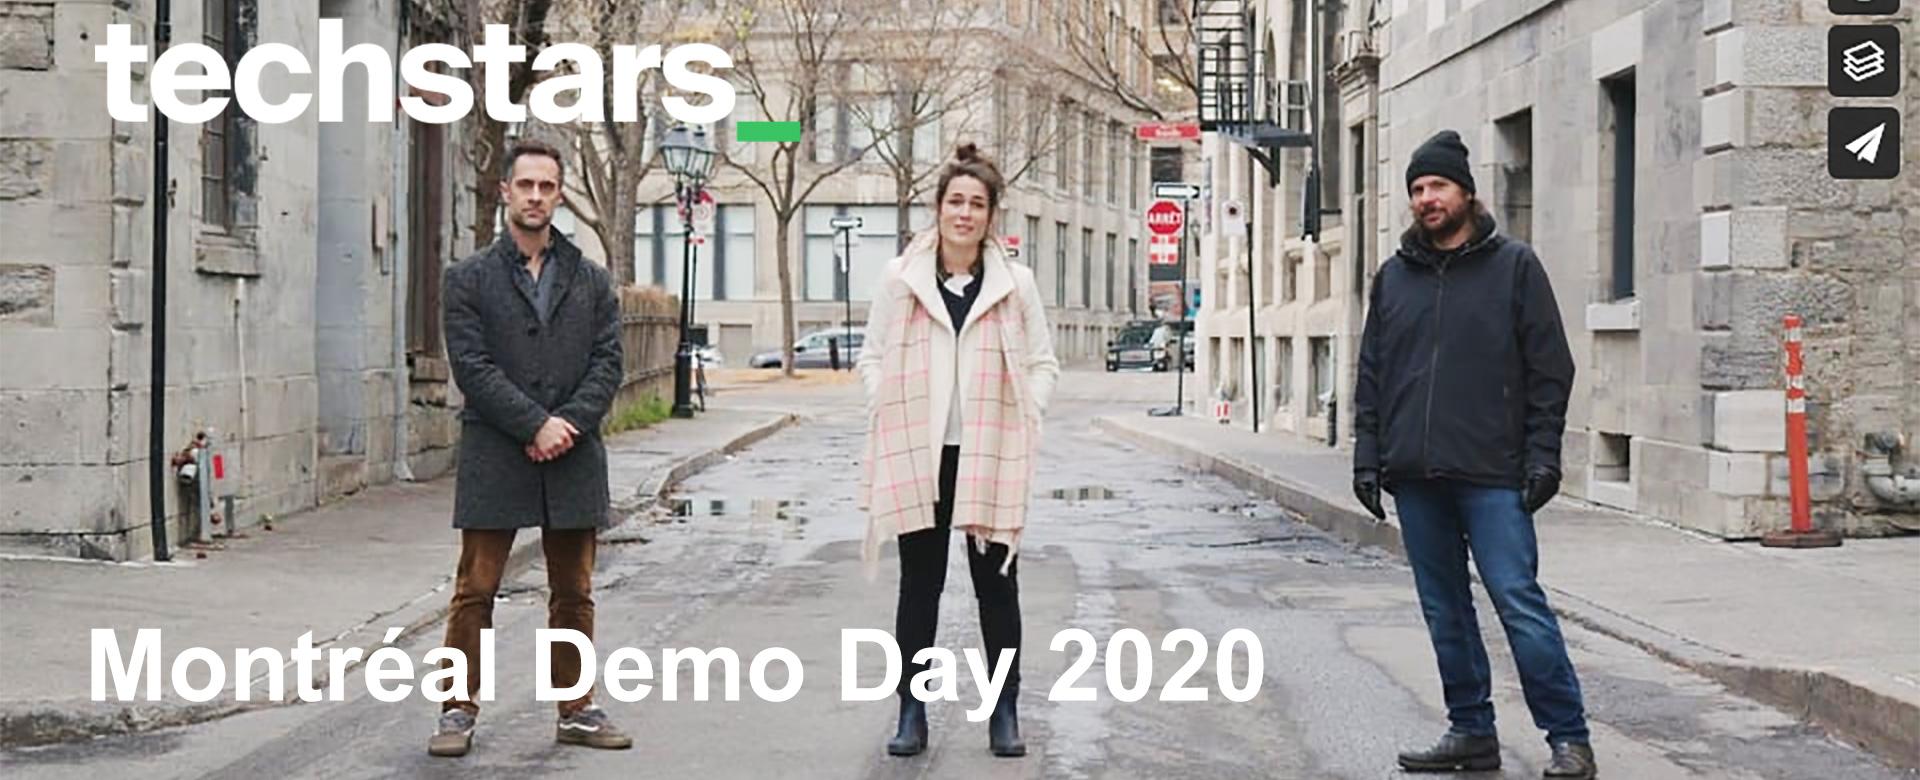 Techstars-Montreal-Demo-Day